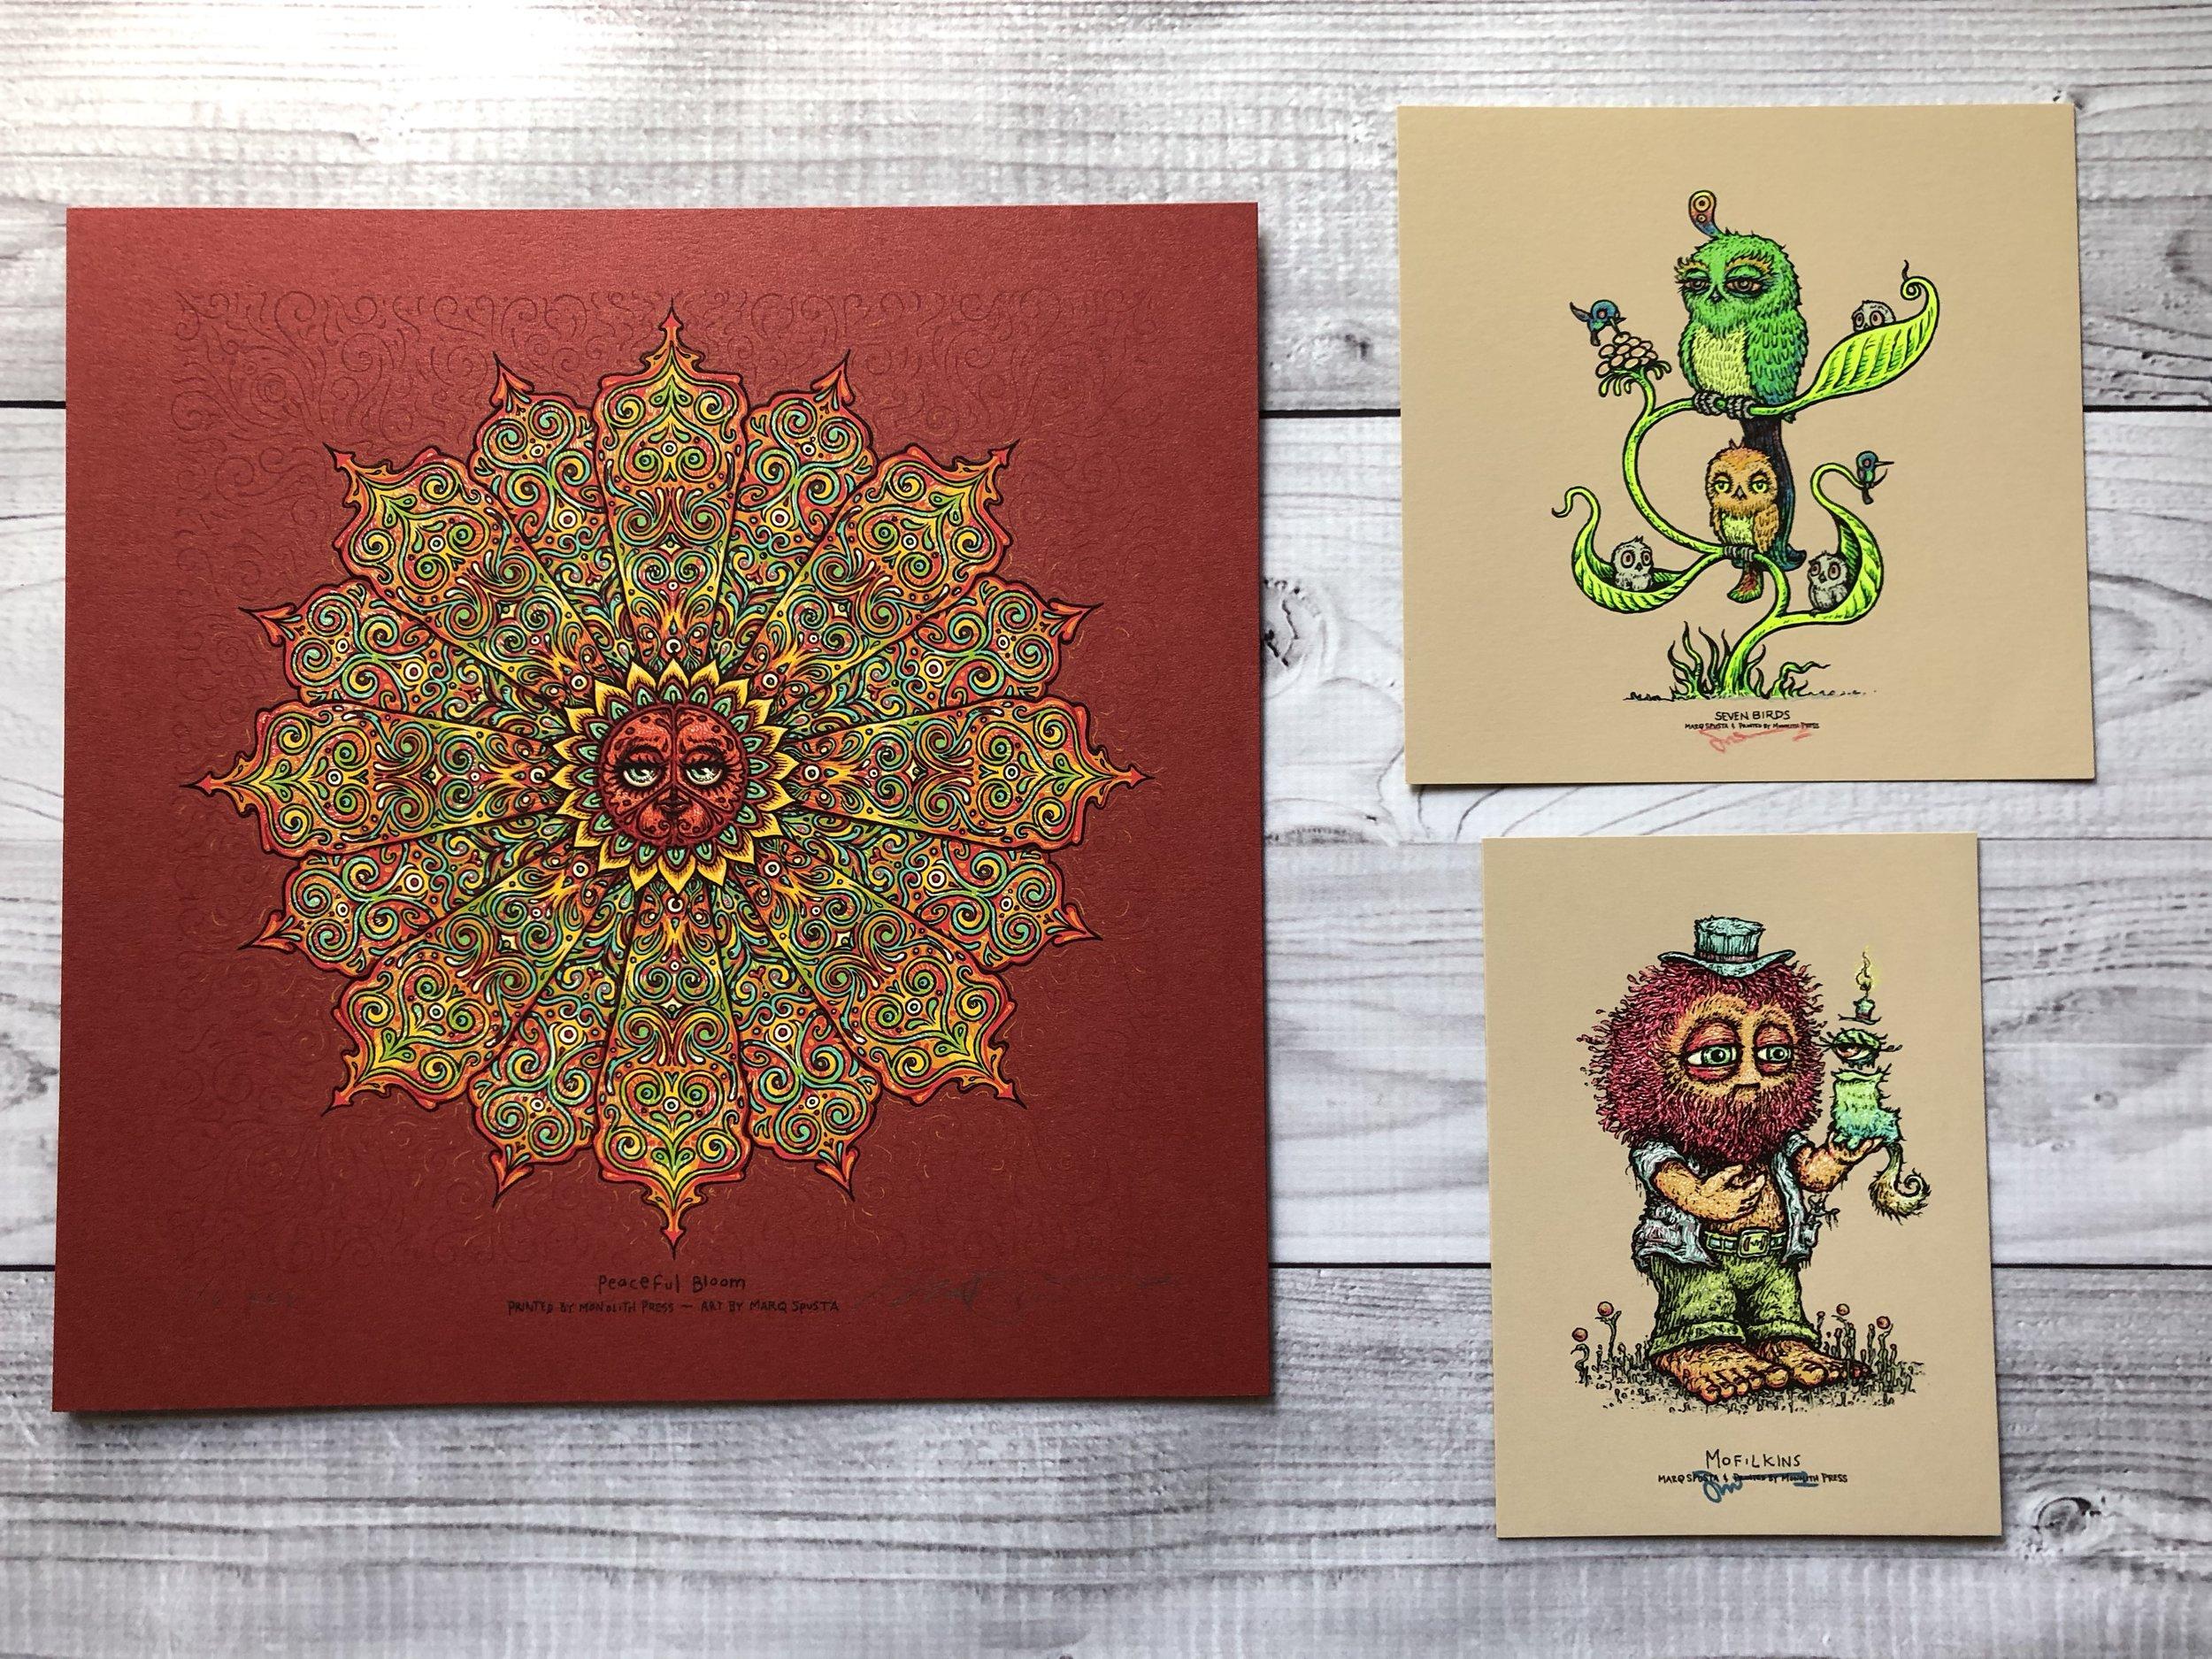 $420 Pack B - Red Peaceful Bloom